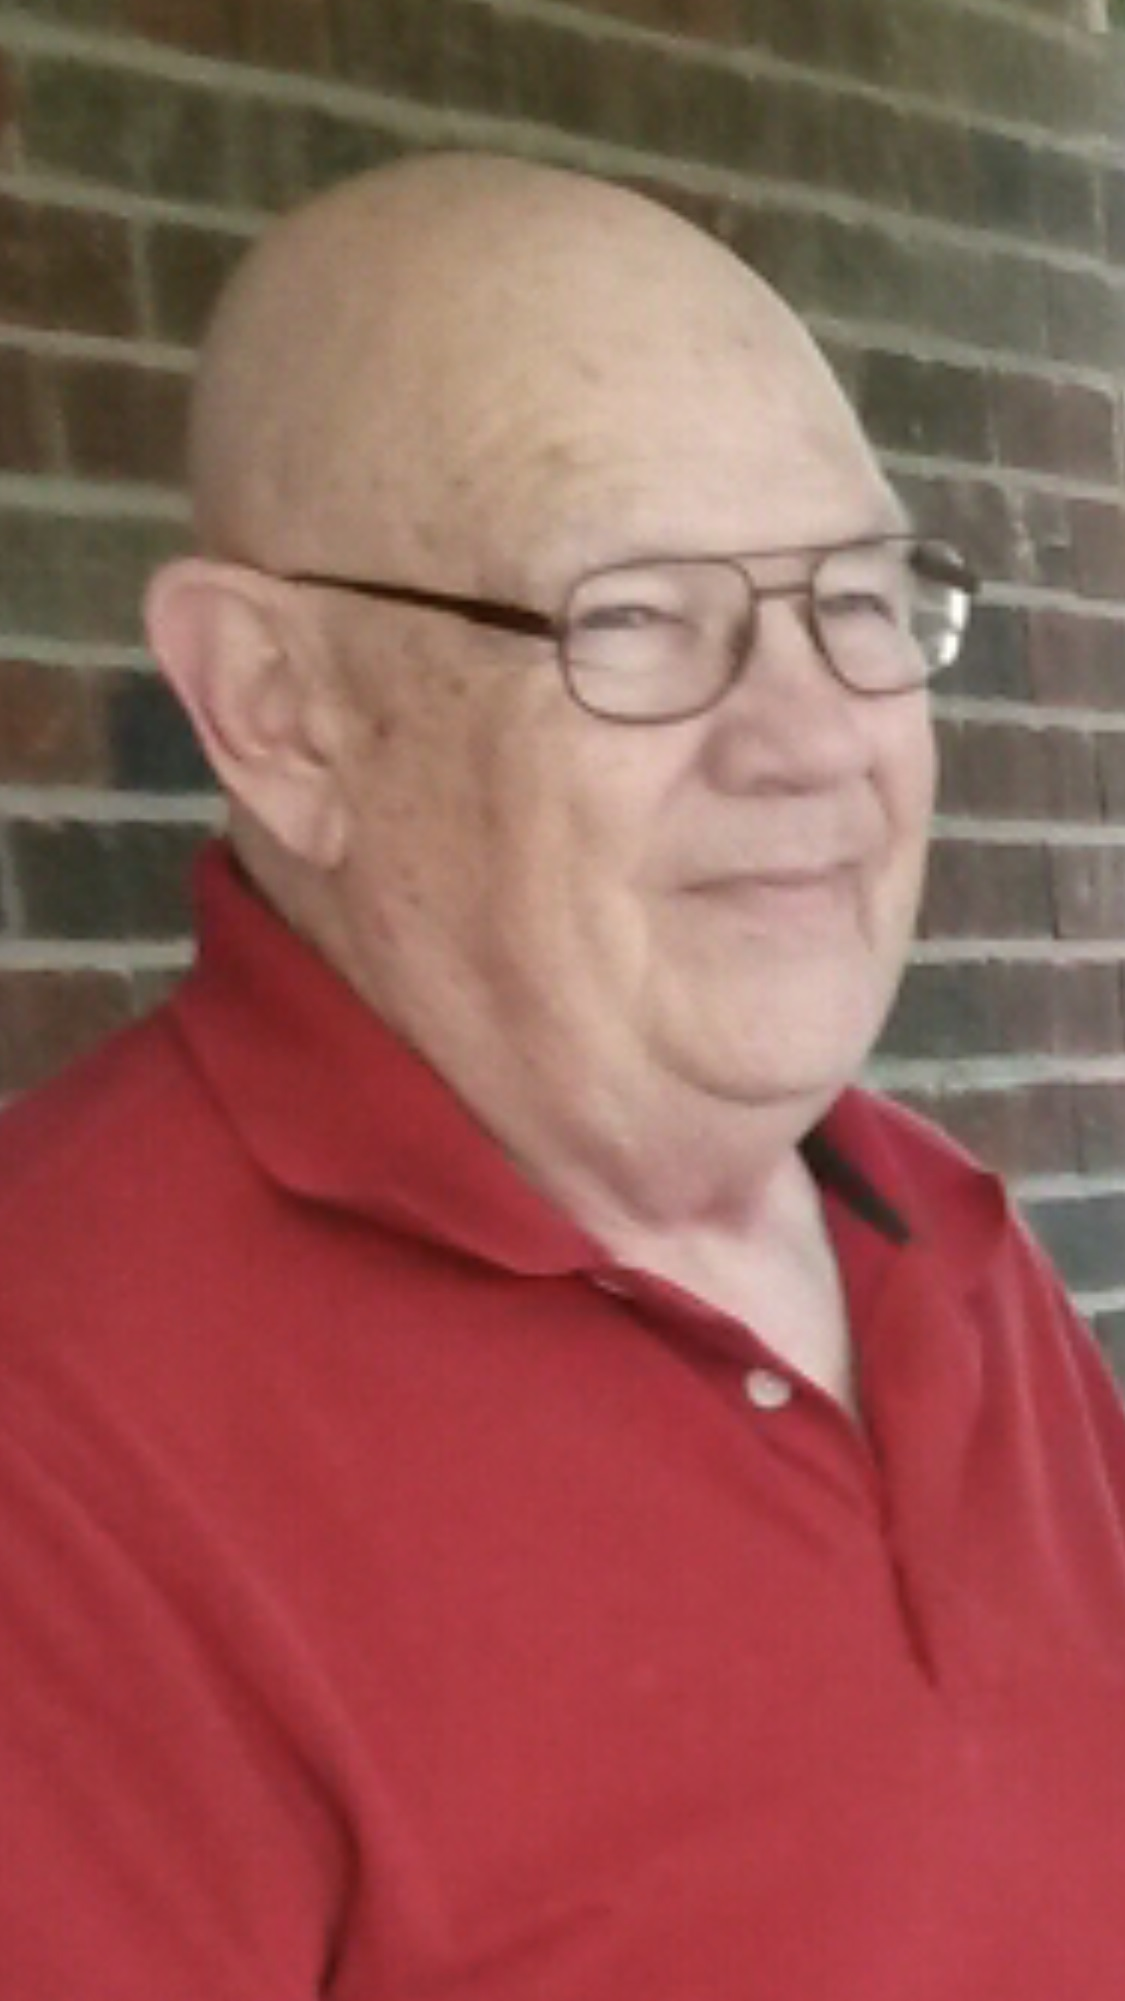 Wesley William Rademacher, age 74, of Huntingburg